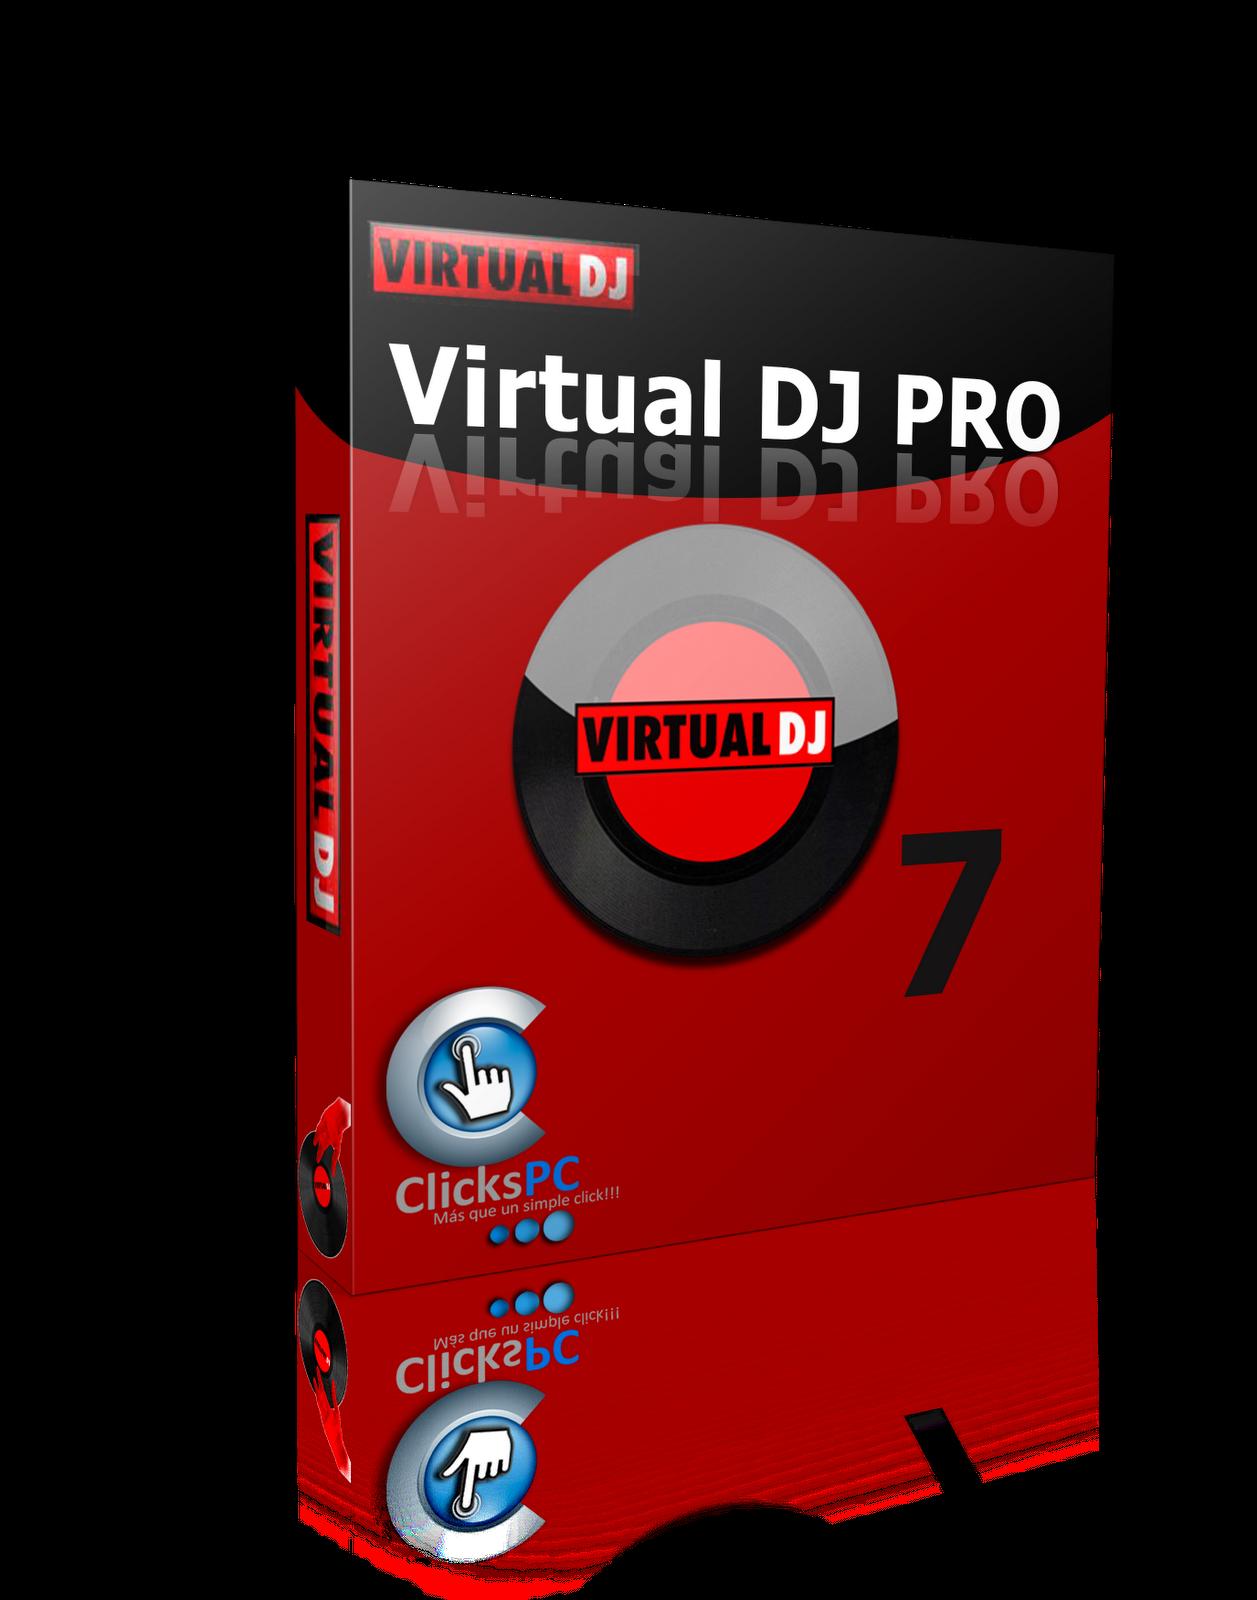 Virtual Dj Pro 7 Portable Portable Version Virtual Dj Pro